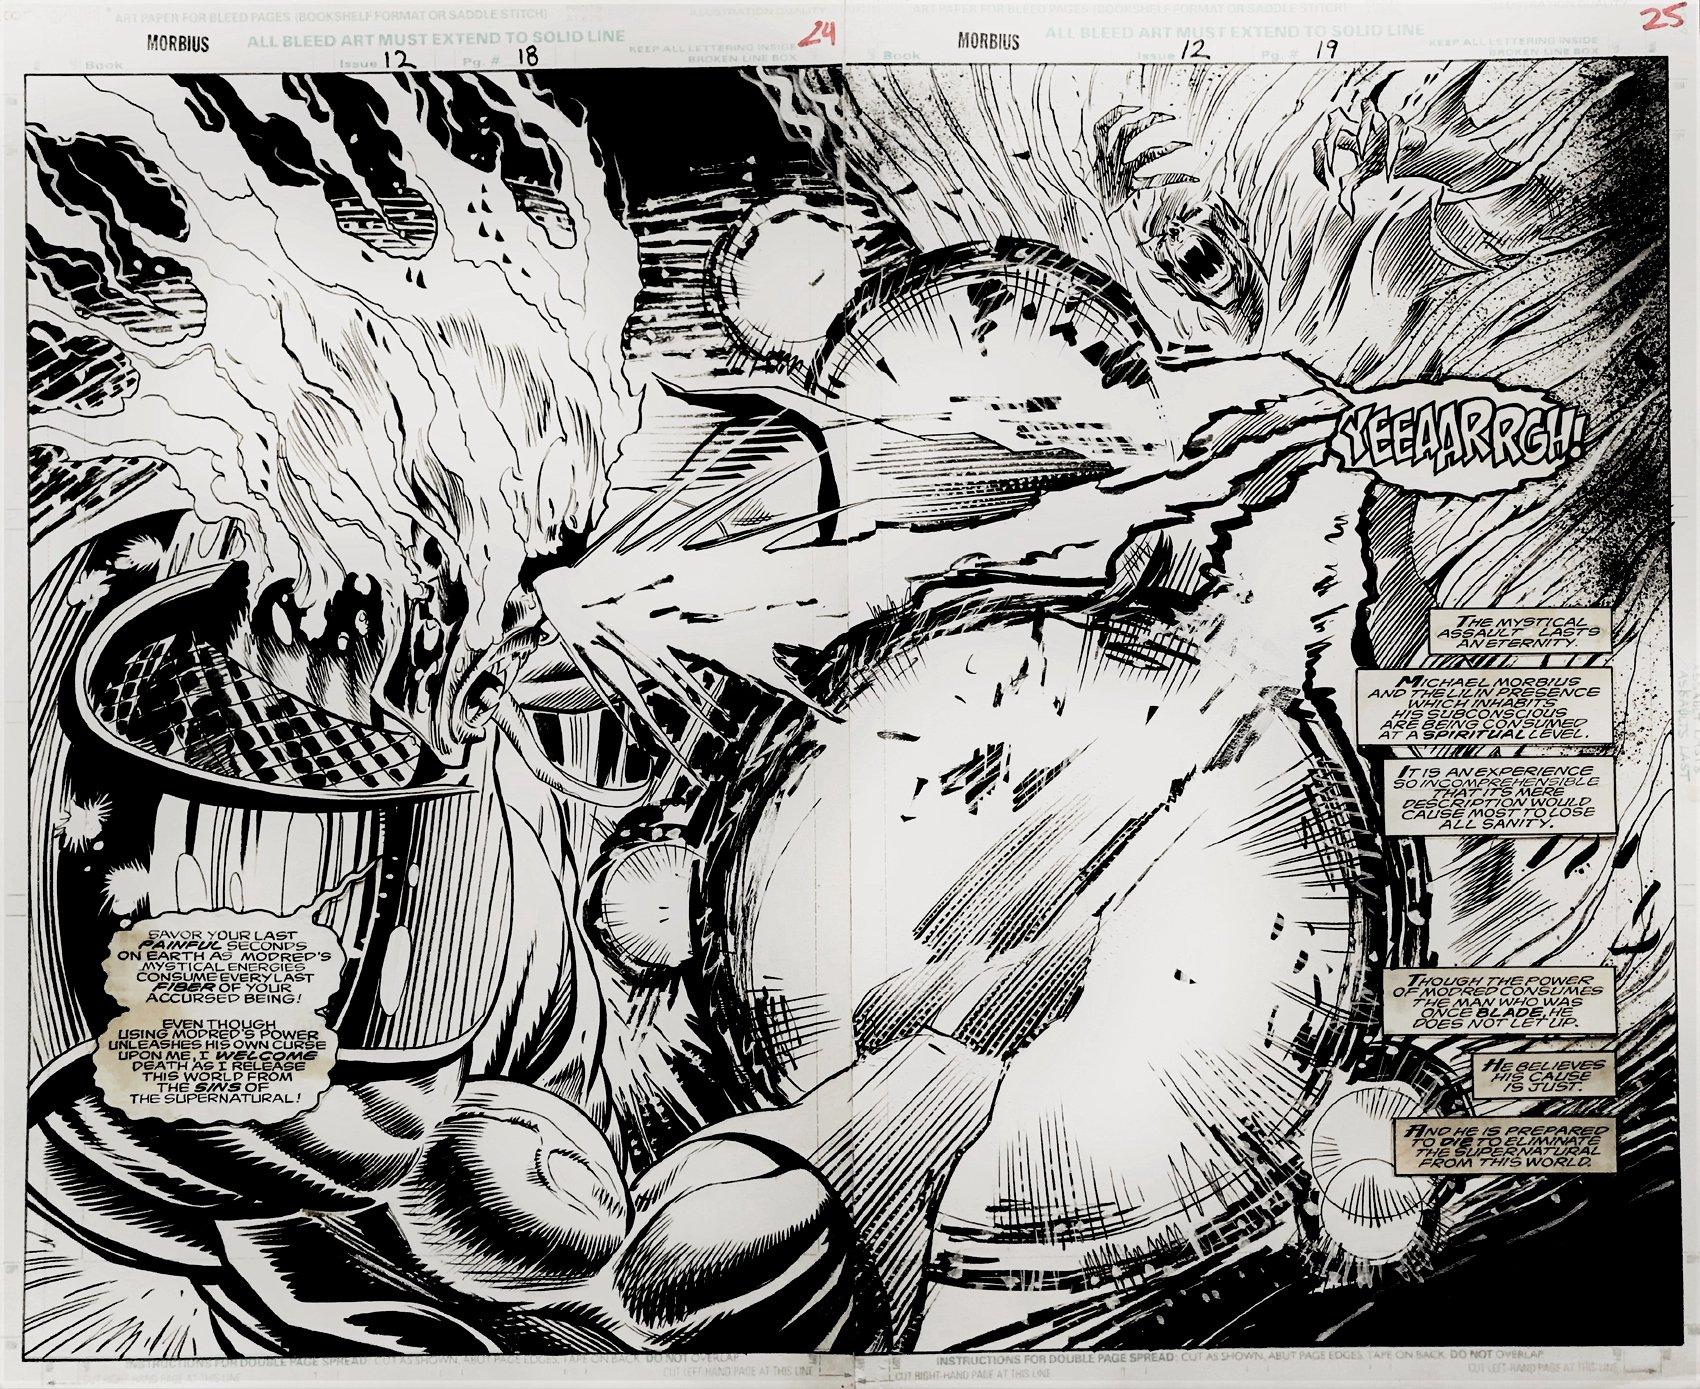 Morbius: The Living Vampire #12 p 18-19 Double Spread Splash (BLADE KILLS MORBIUS RT HERE!) !) 1993